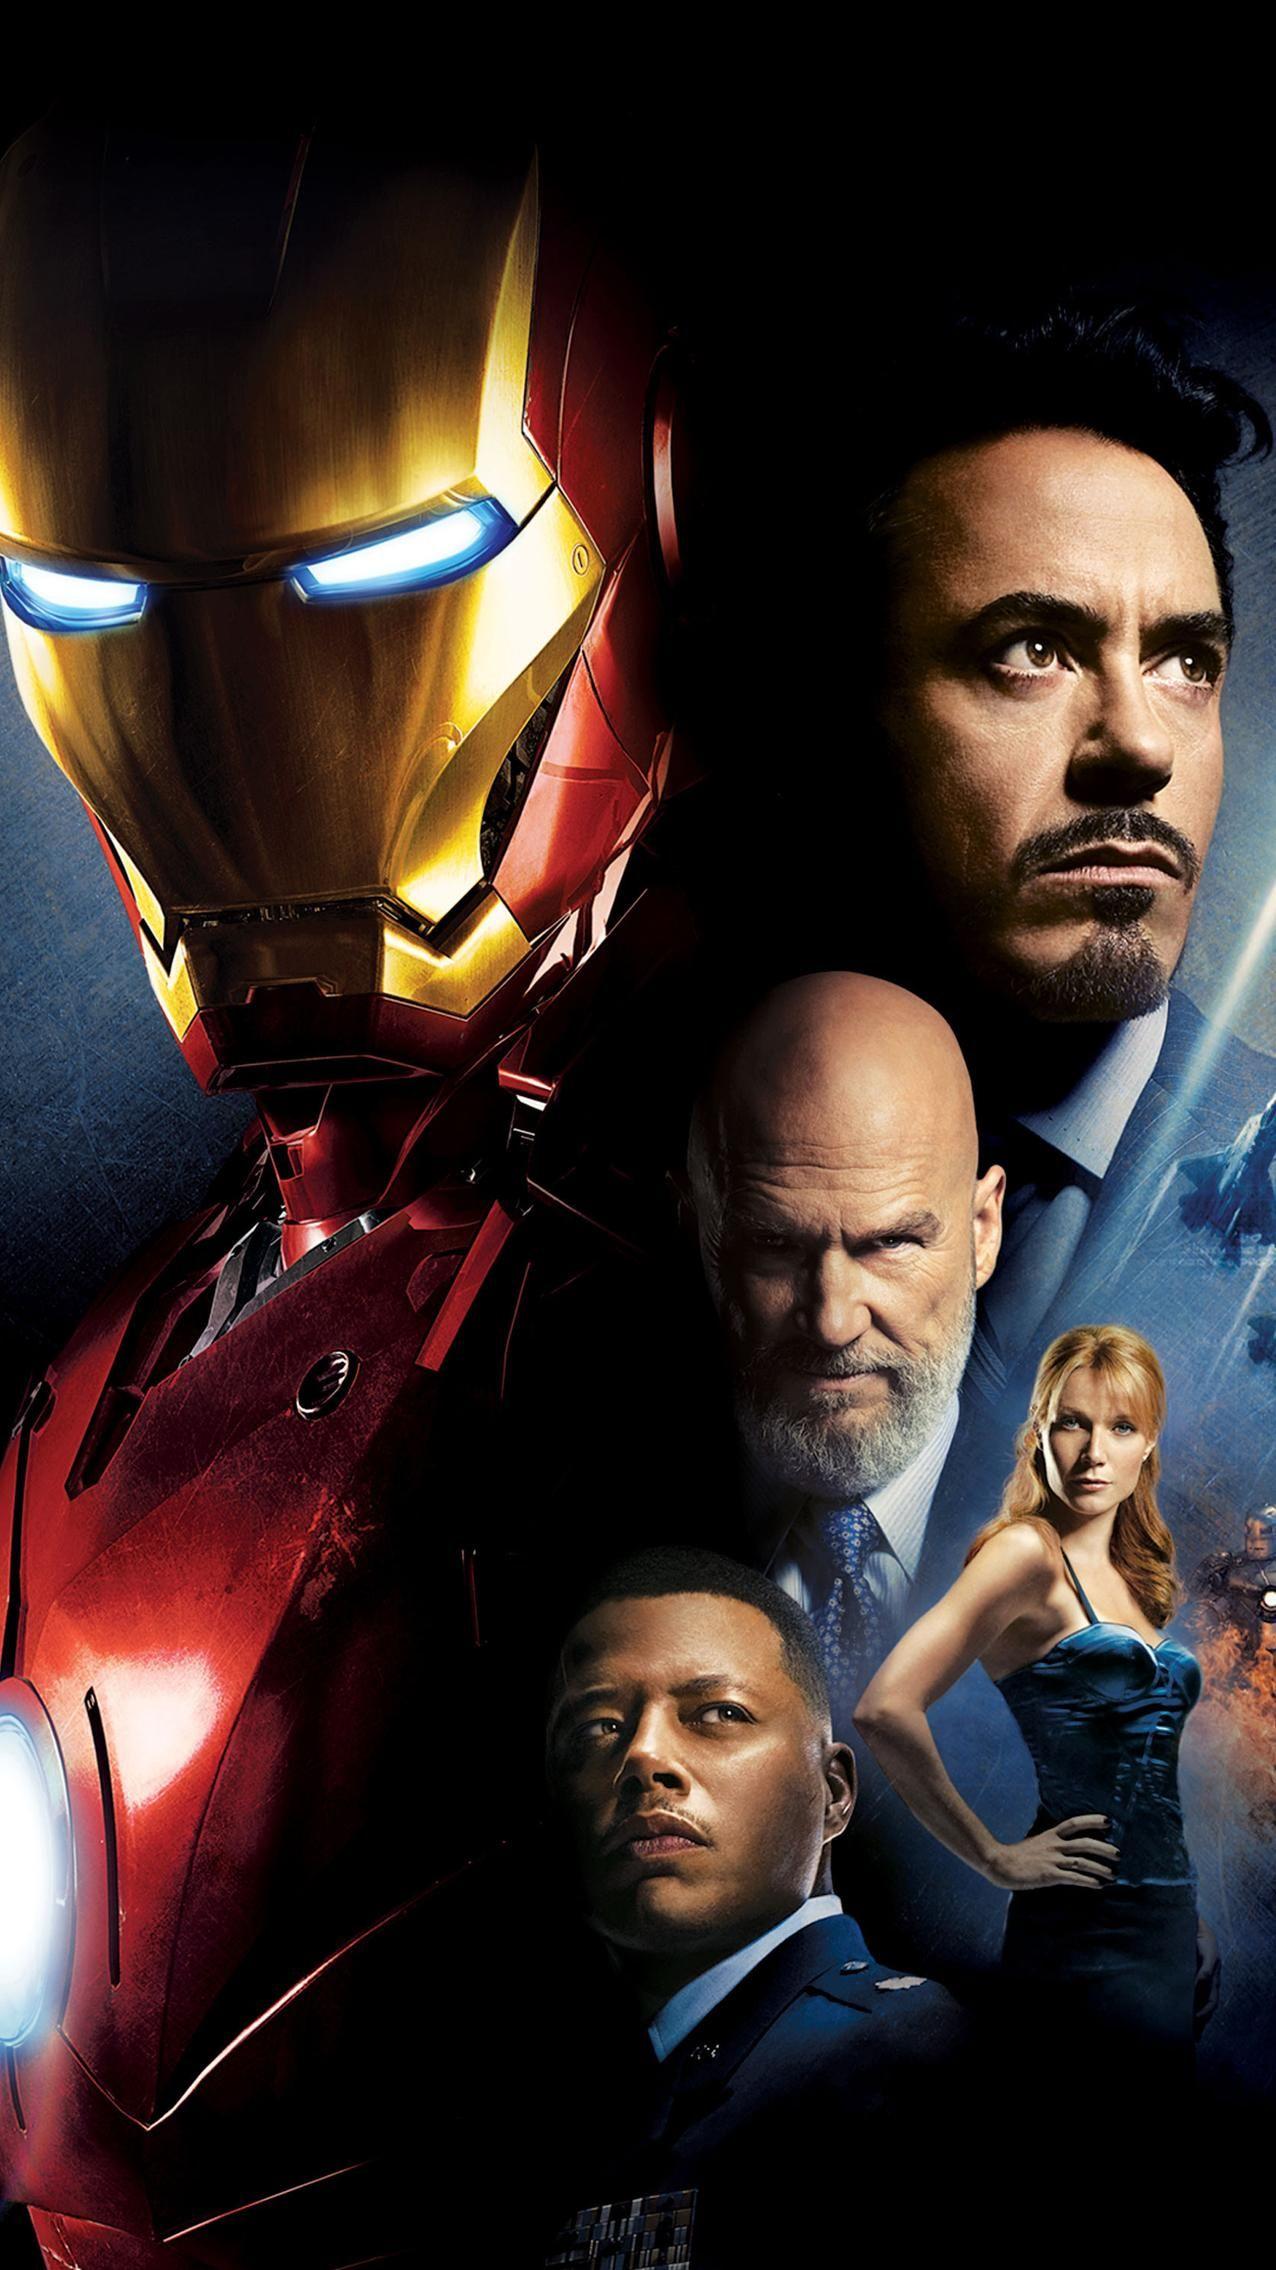 Iron Man (2008) Phone Wallpaper | Moviemania